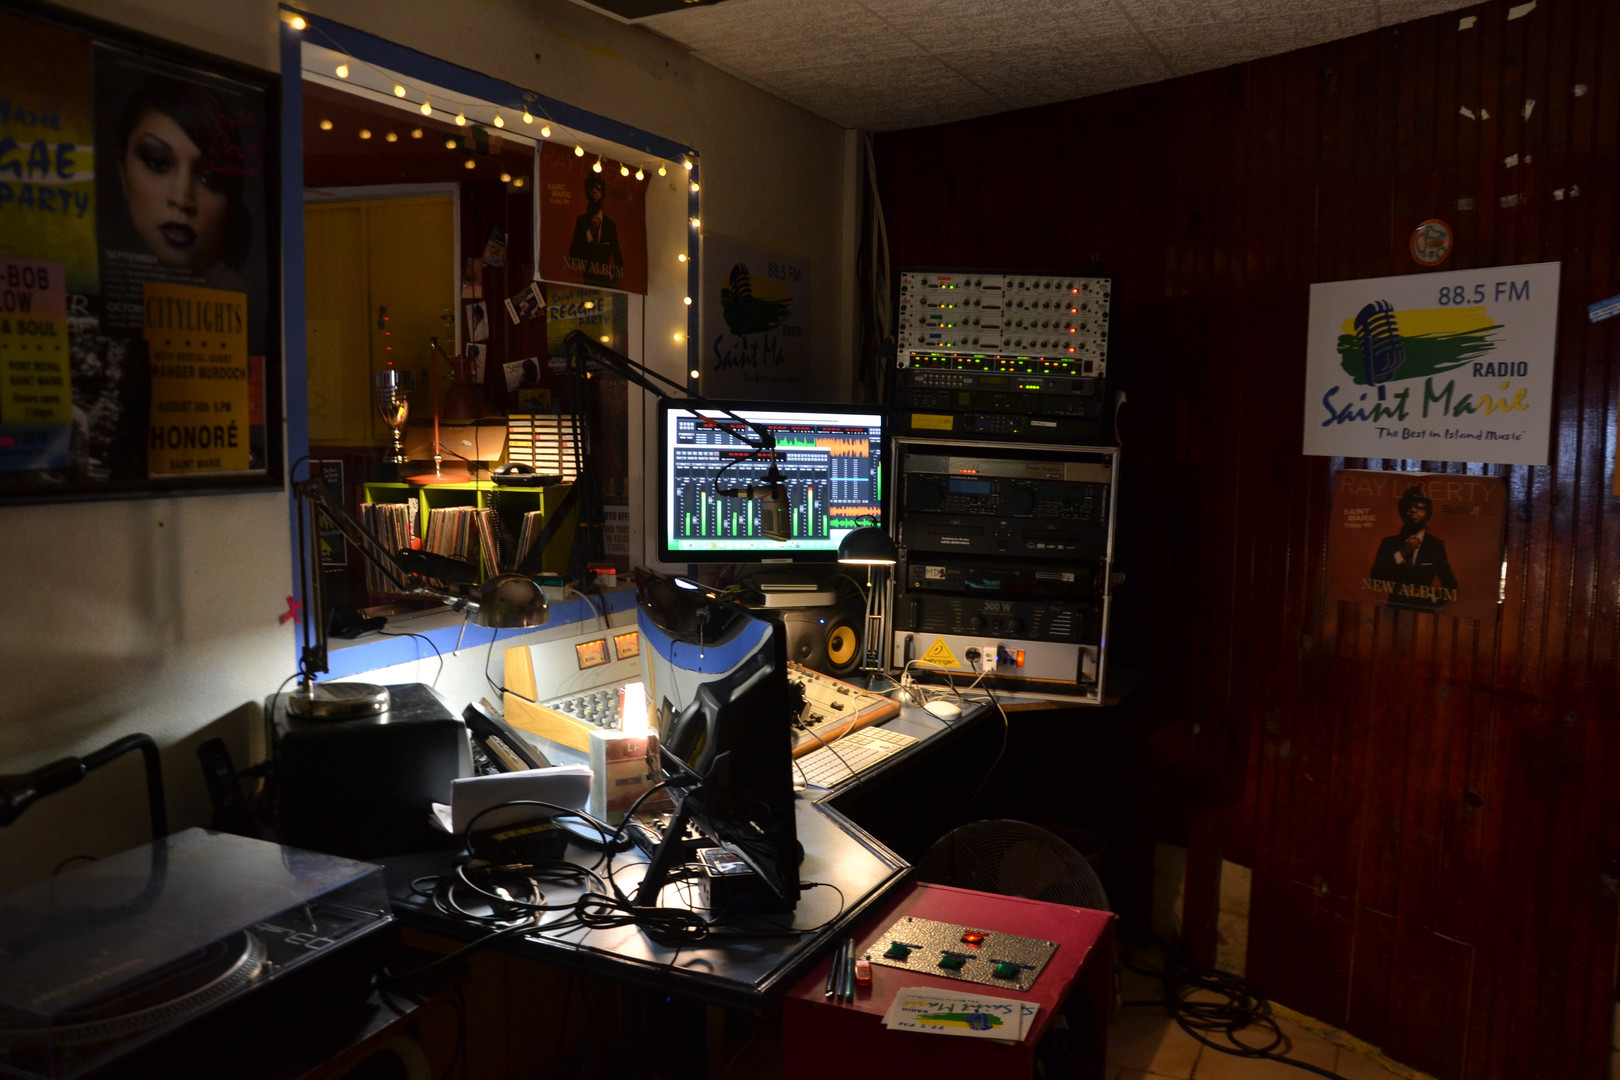 St Marie Radio Station